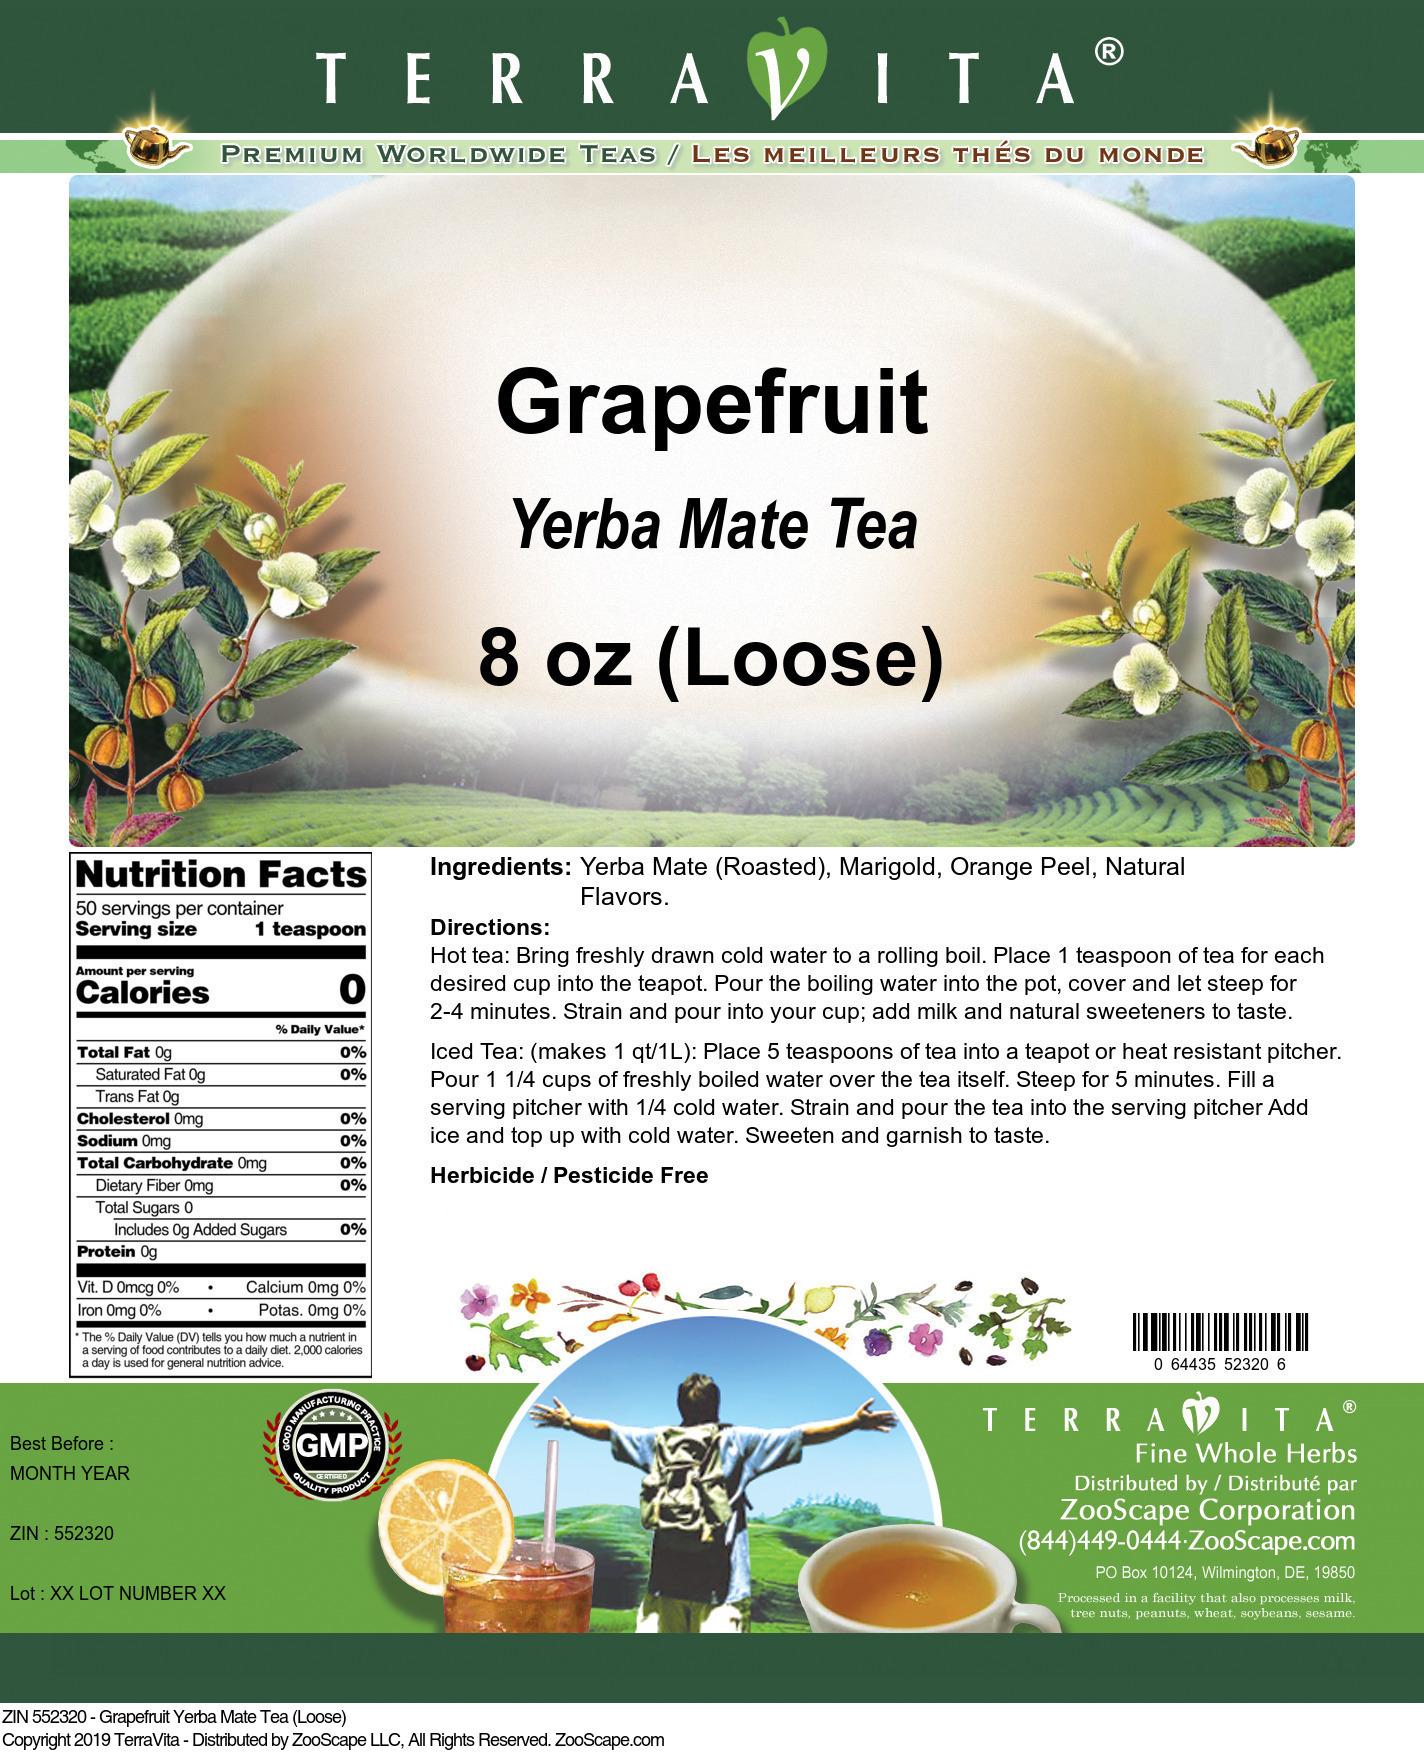 Grapefruit Yerba Mate